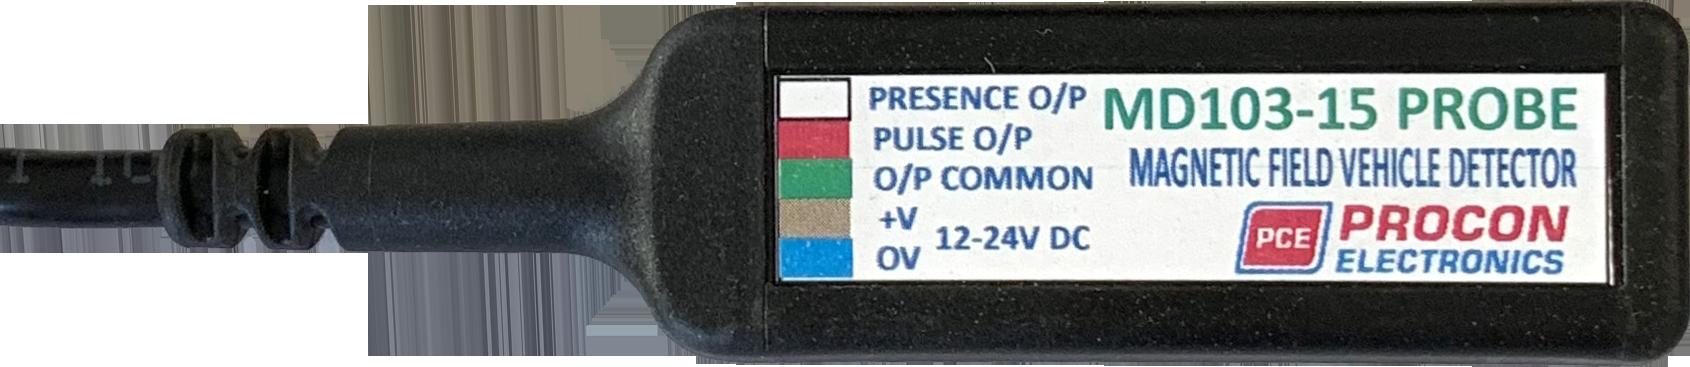 MD103-15_PROBE_INDIVIDUAL